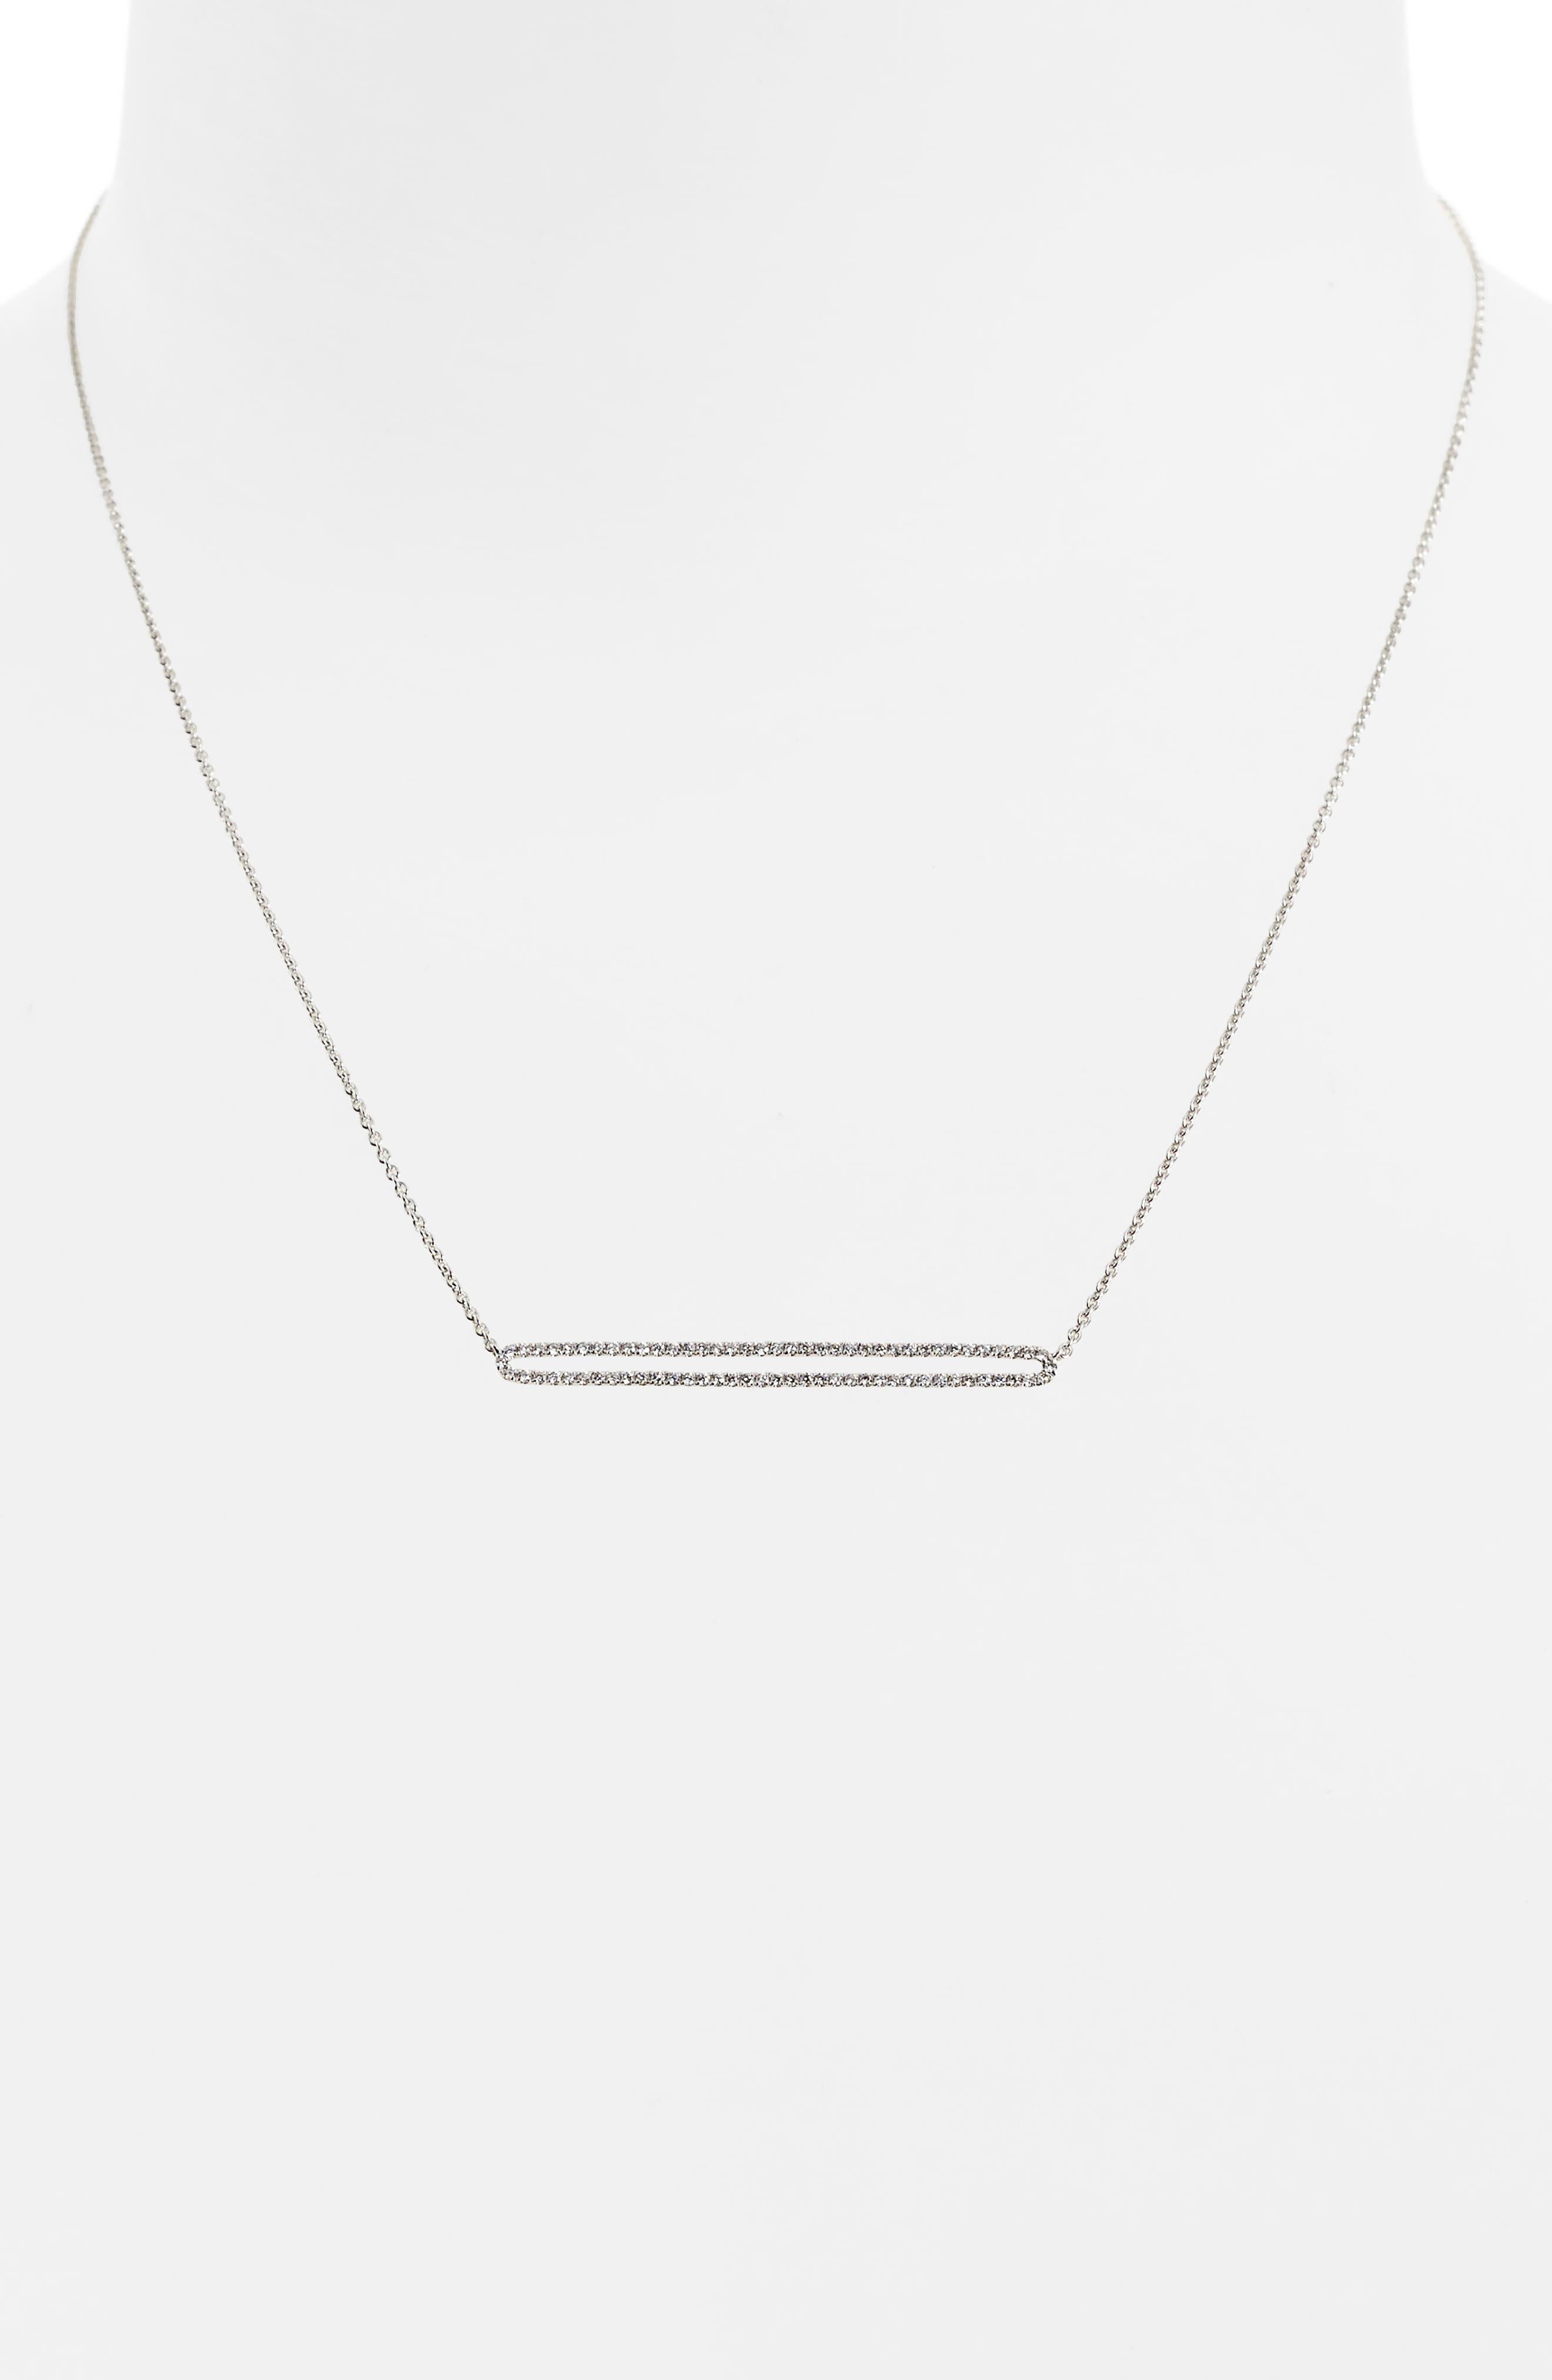 Geo Diamond Pendant Necklace,                             Alternate thumbnail 2, color,                             White Gold